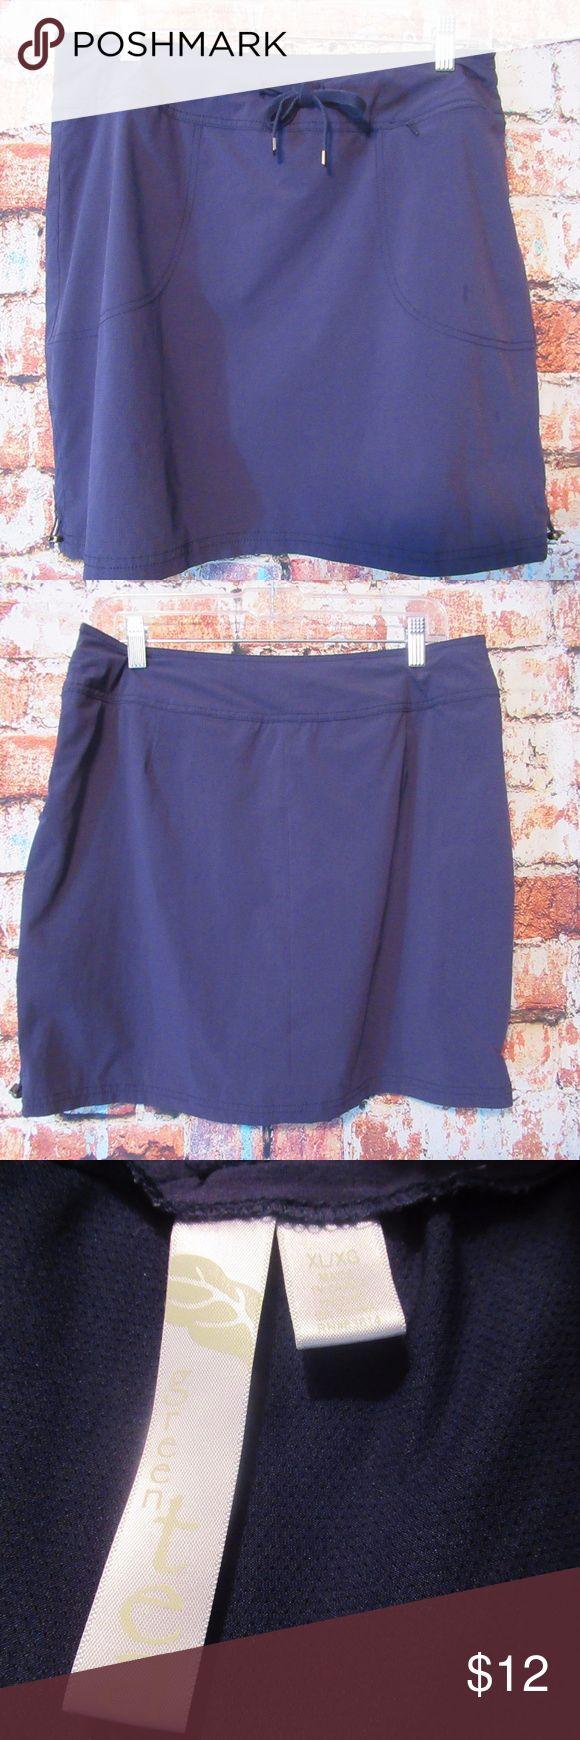 Green Tea Blue Women's Tie Front Skorts Size XL Excellent pre-owned skorts b…